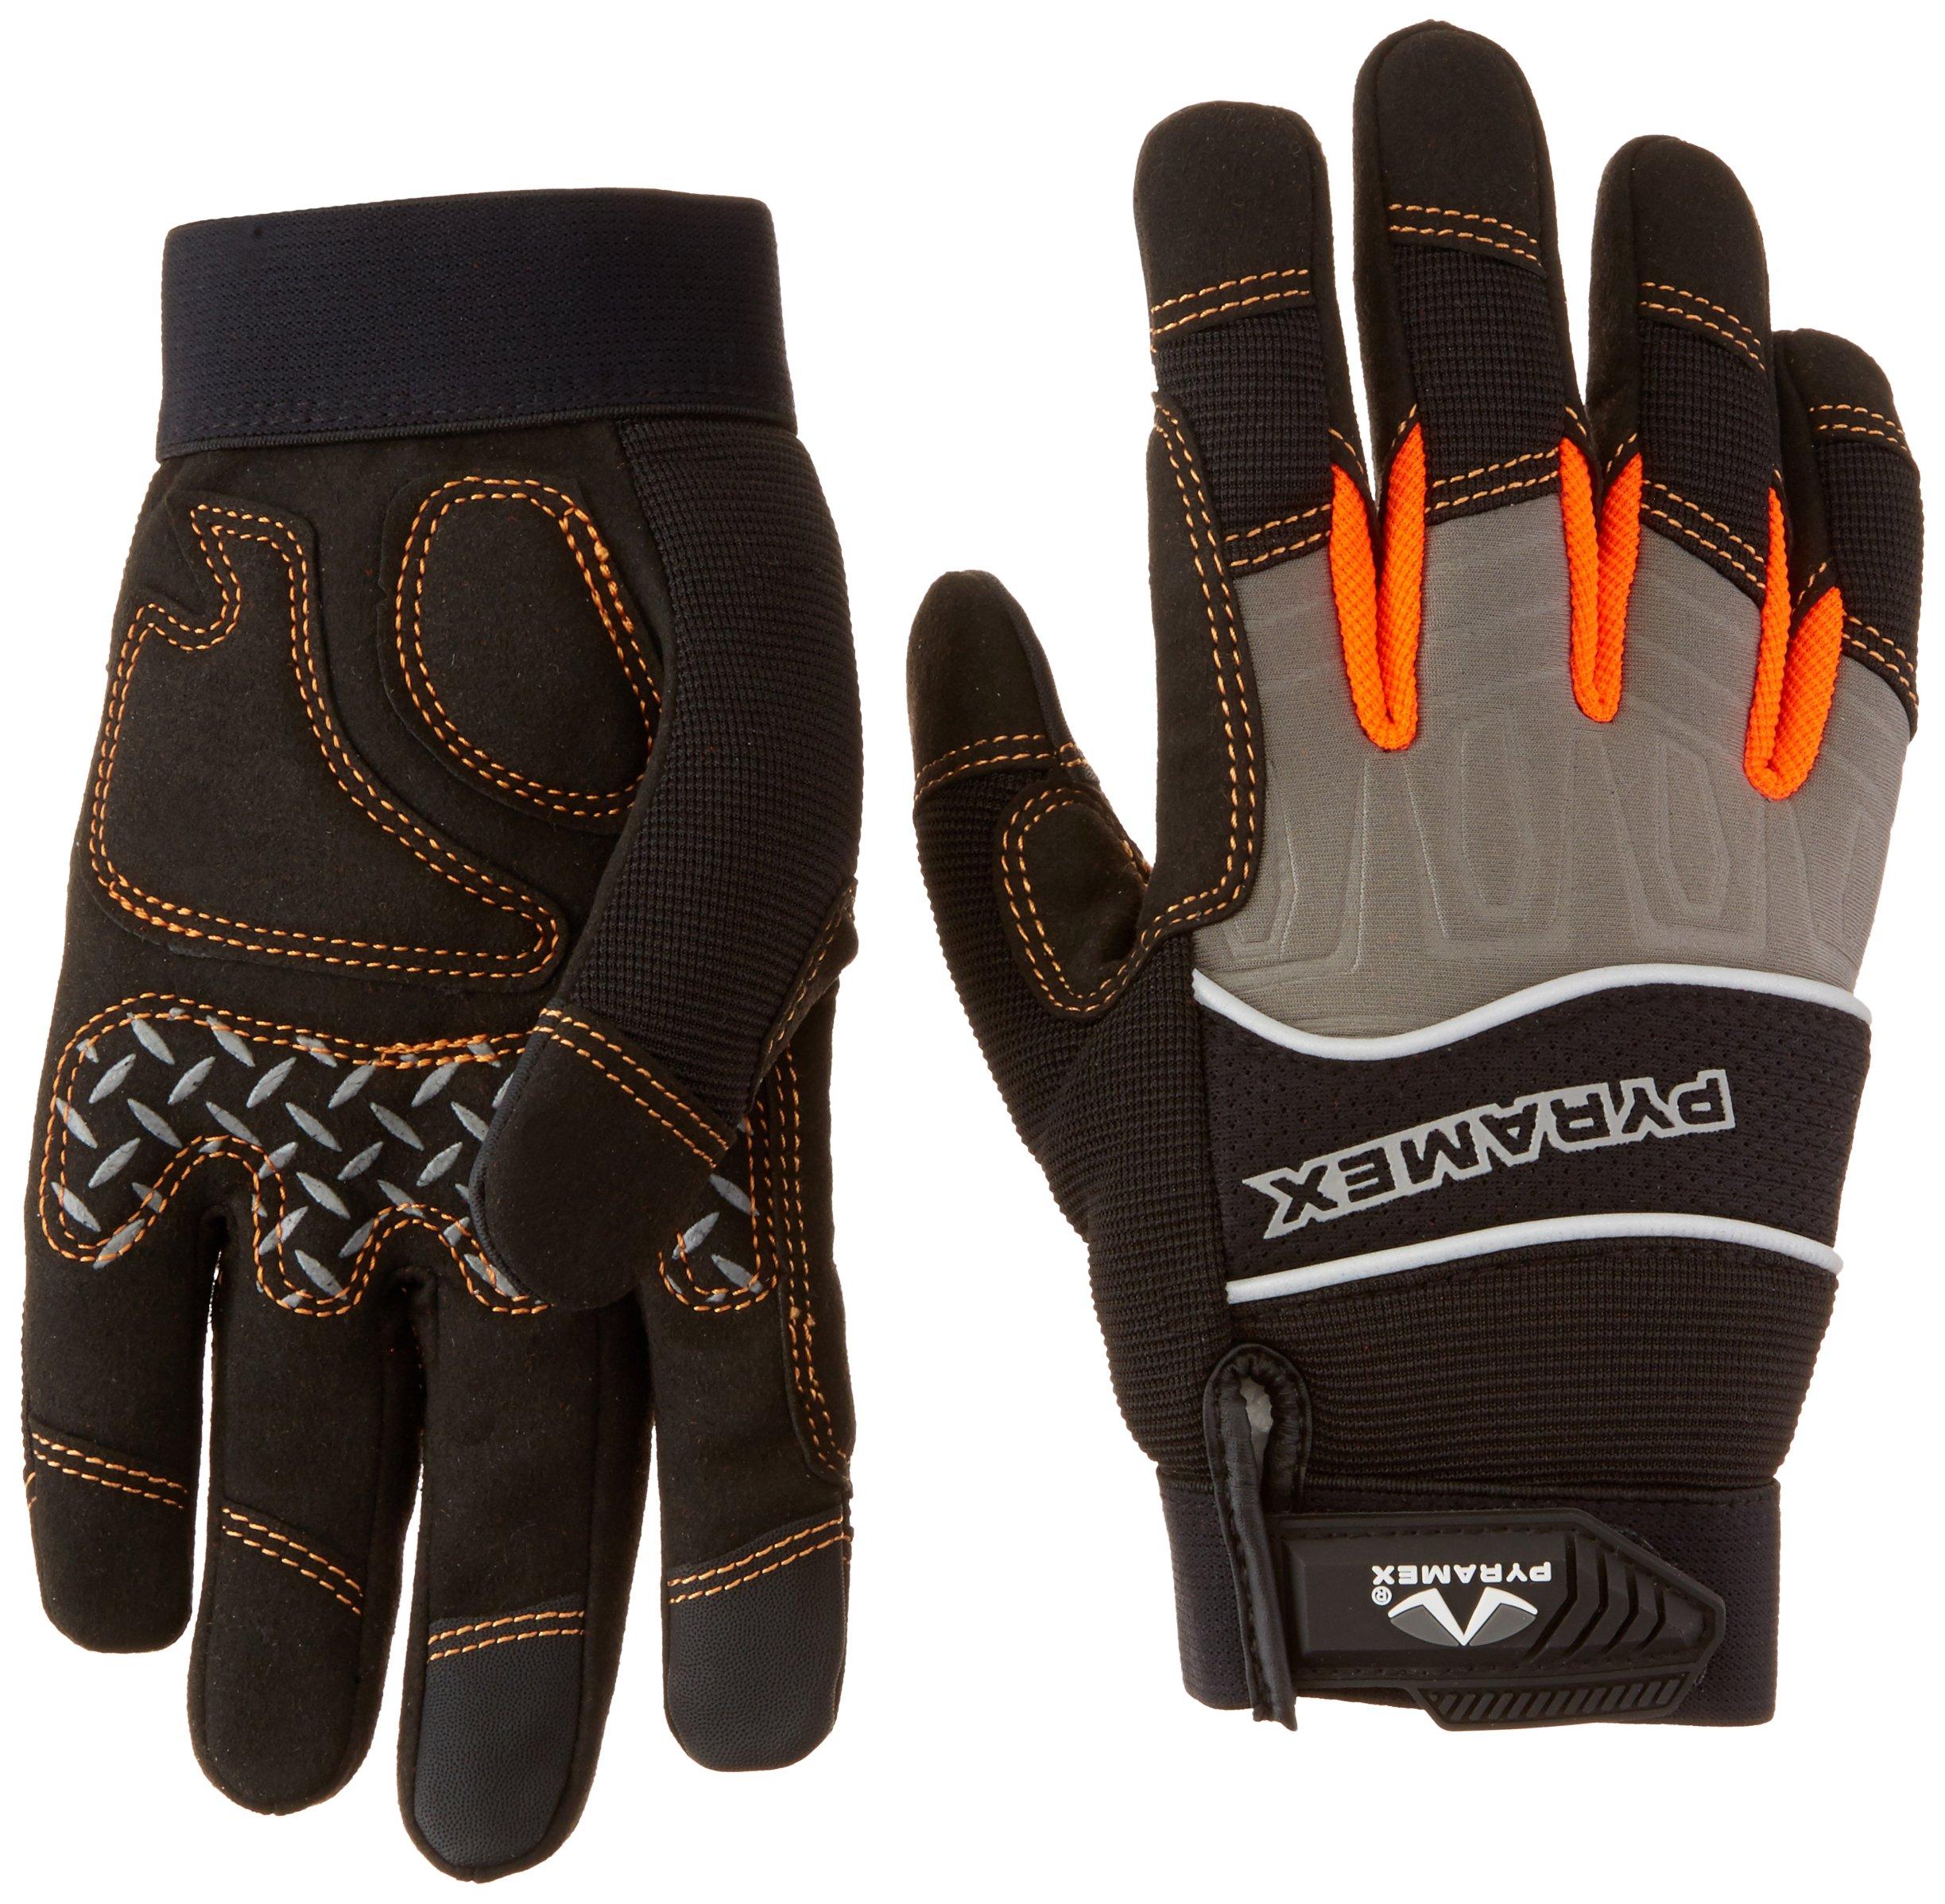 Pyramex Touchscreen-Compatible Medium Duty Work Gloves by Pyramex Safety